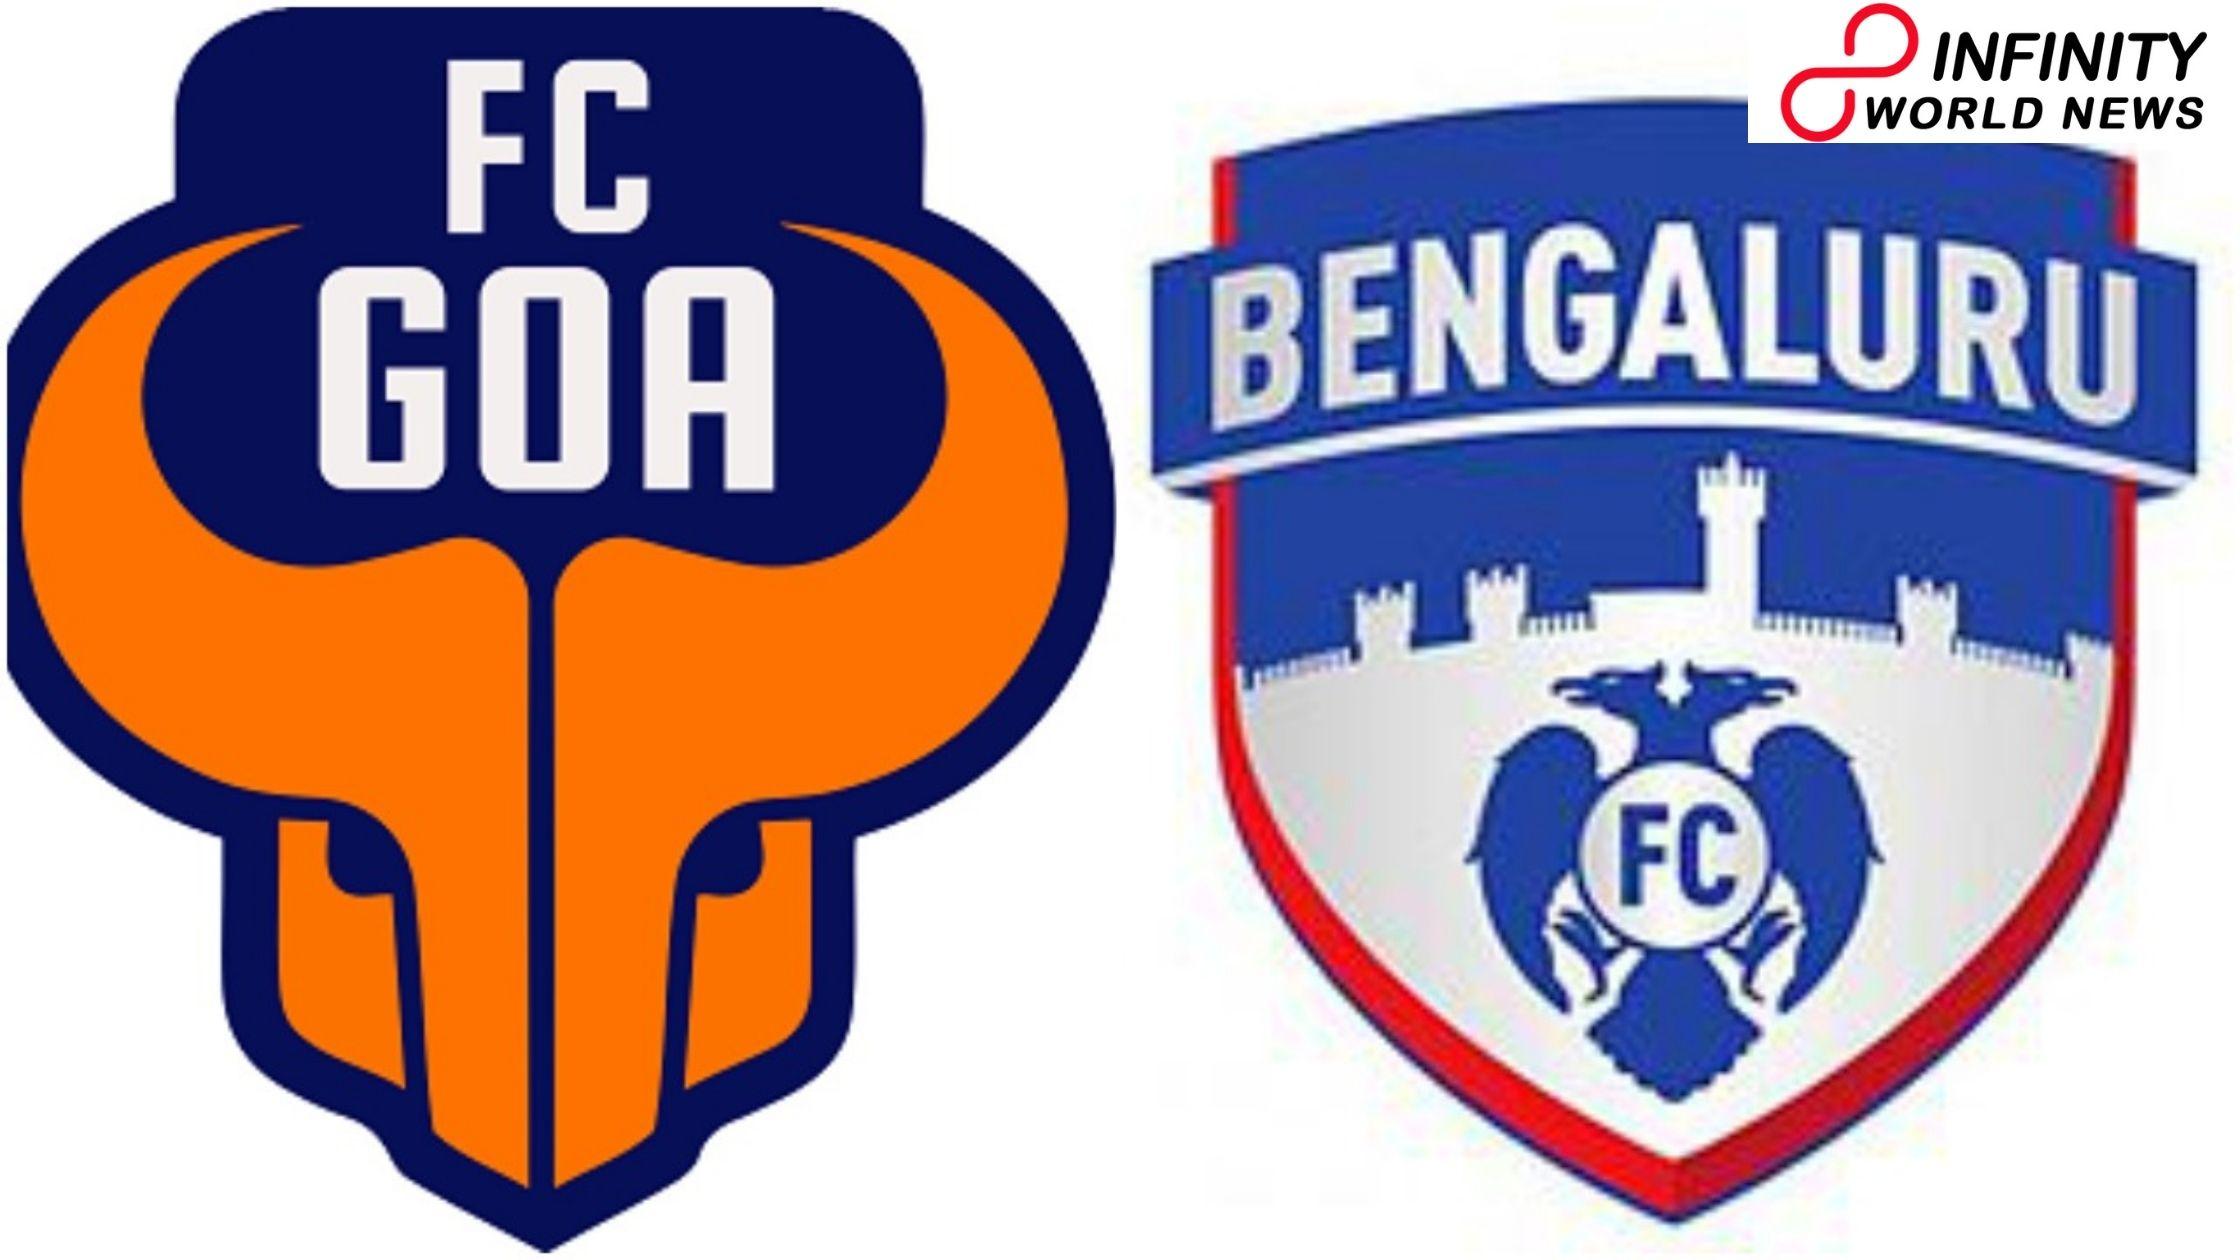 FC Goa Bengaluru FC share ruins after 2-2 draw at Fatorda